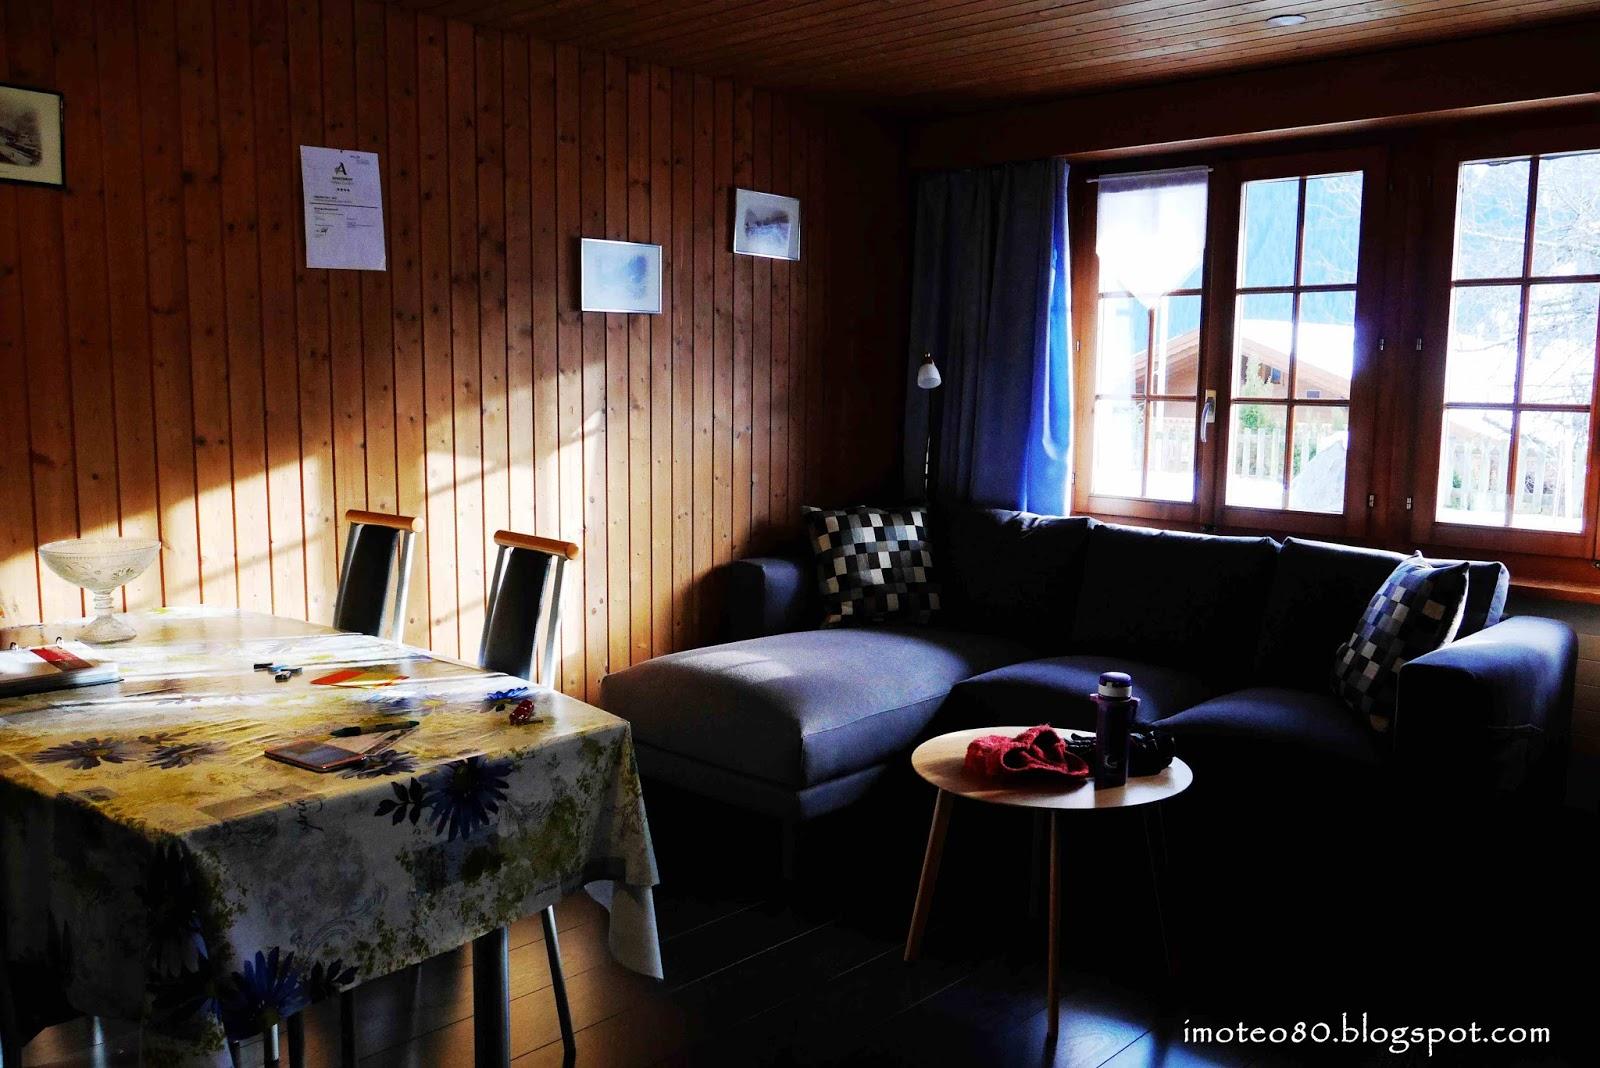 Nice Kitchen Tables Chairs Ikea 小女人的小天地: 【欧游住宿】瑞士。greendelwald (airbnb)